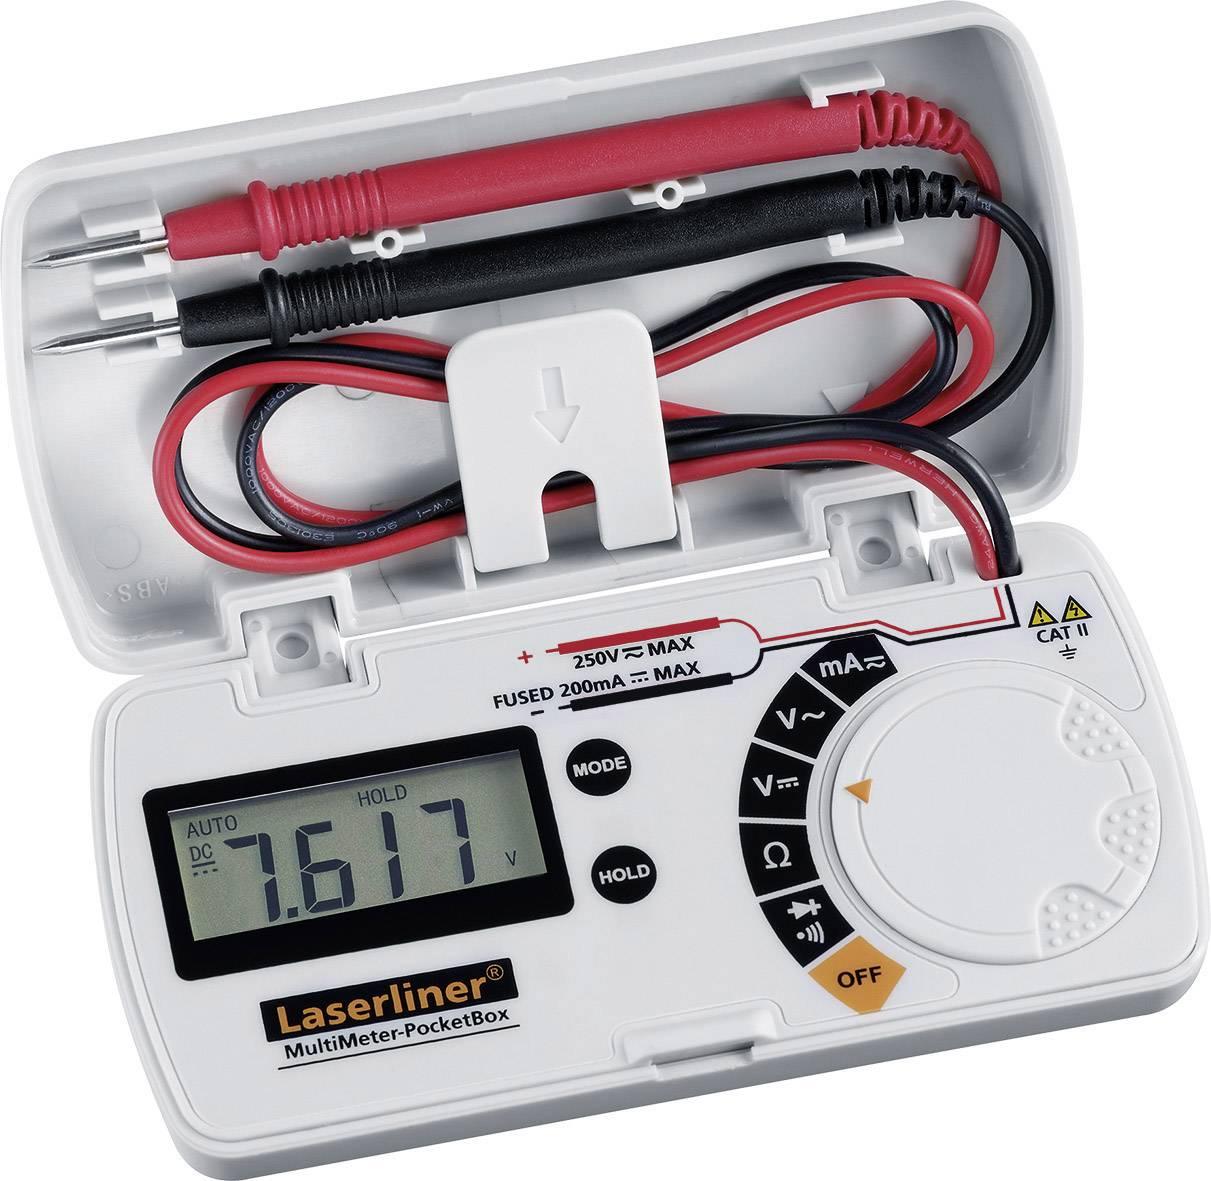 Digitálne/y ručný multimeter Laserliner MultiMeter Pocket Box 083.028A